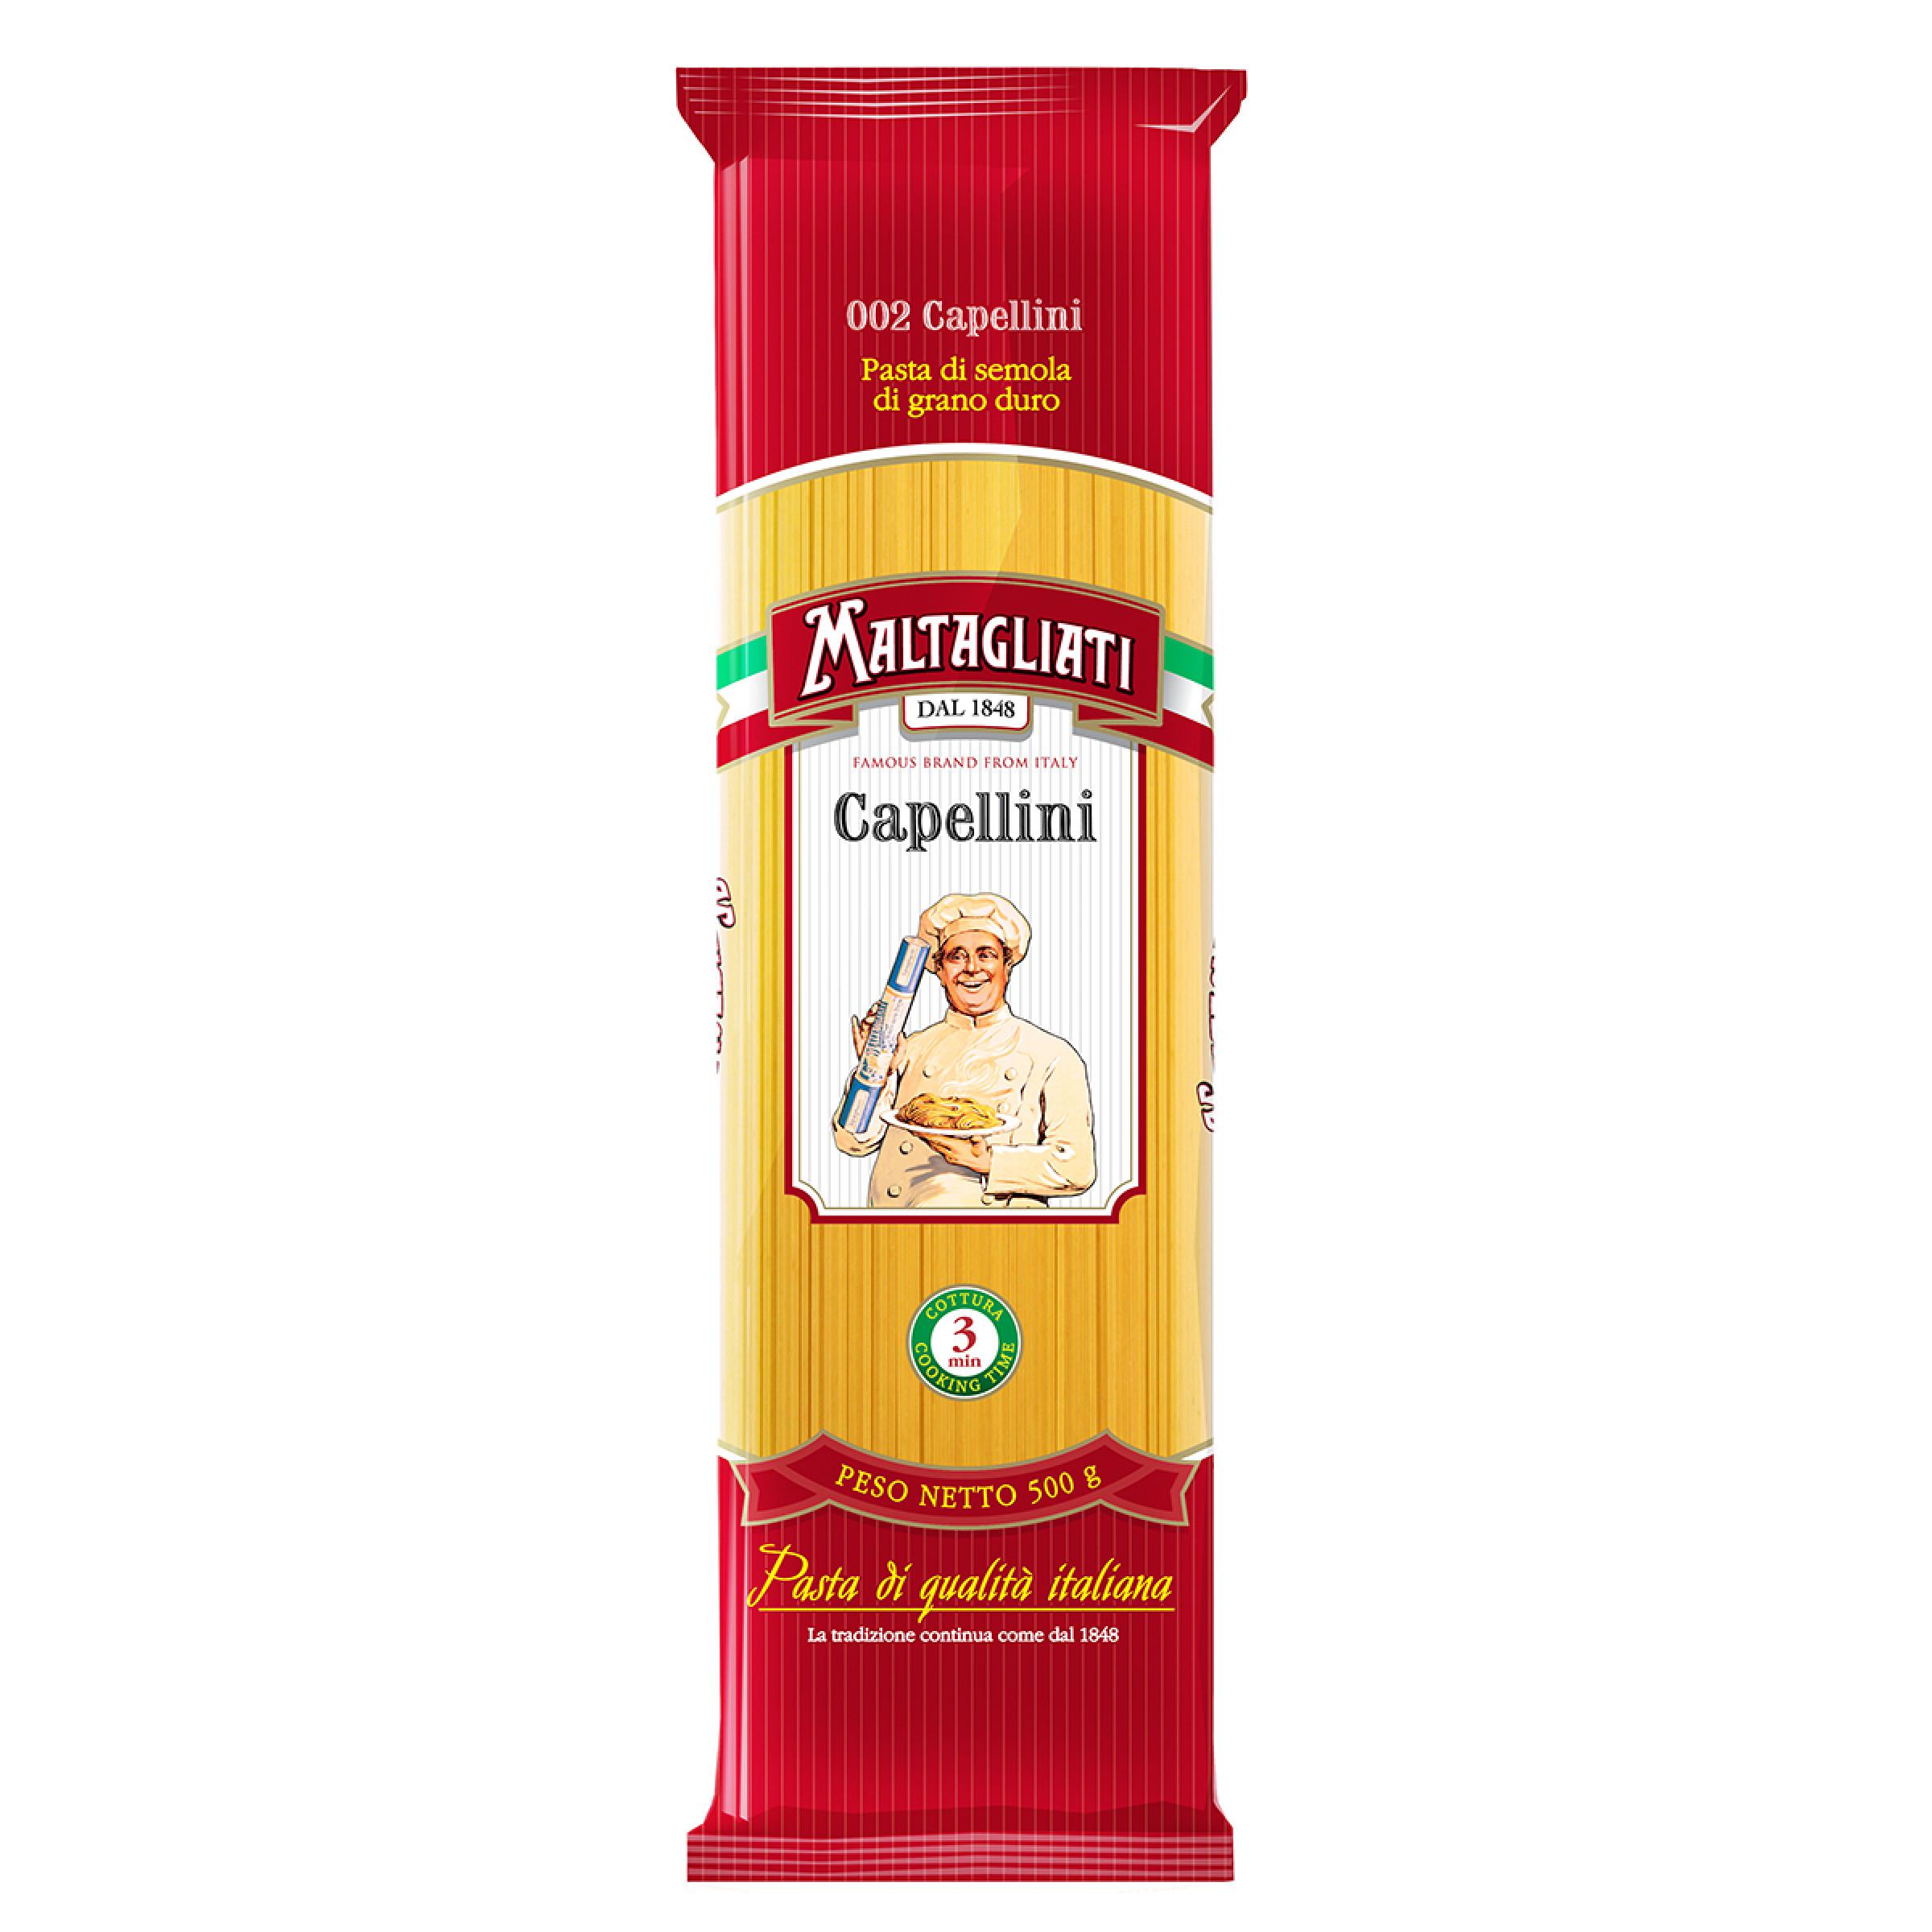 Спагетти capellini Maltagliati №2, 500г